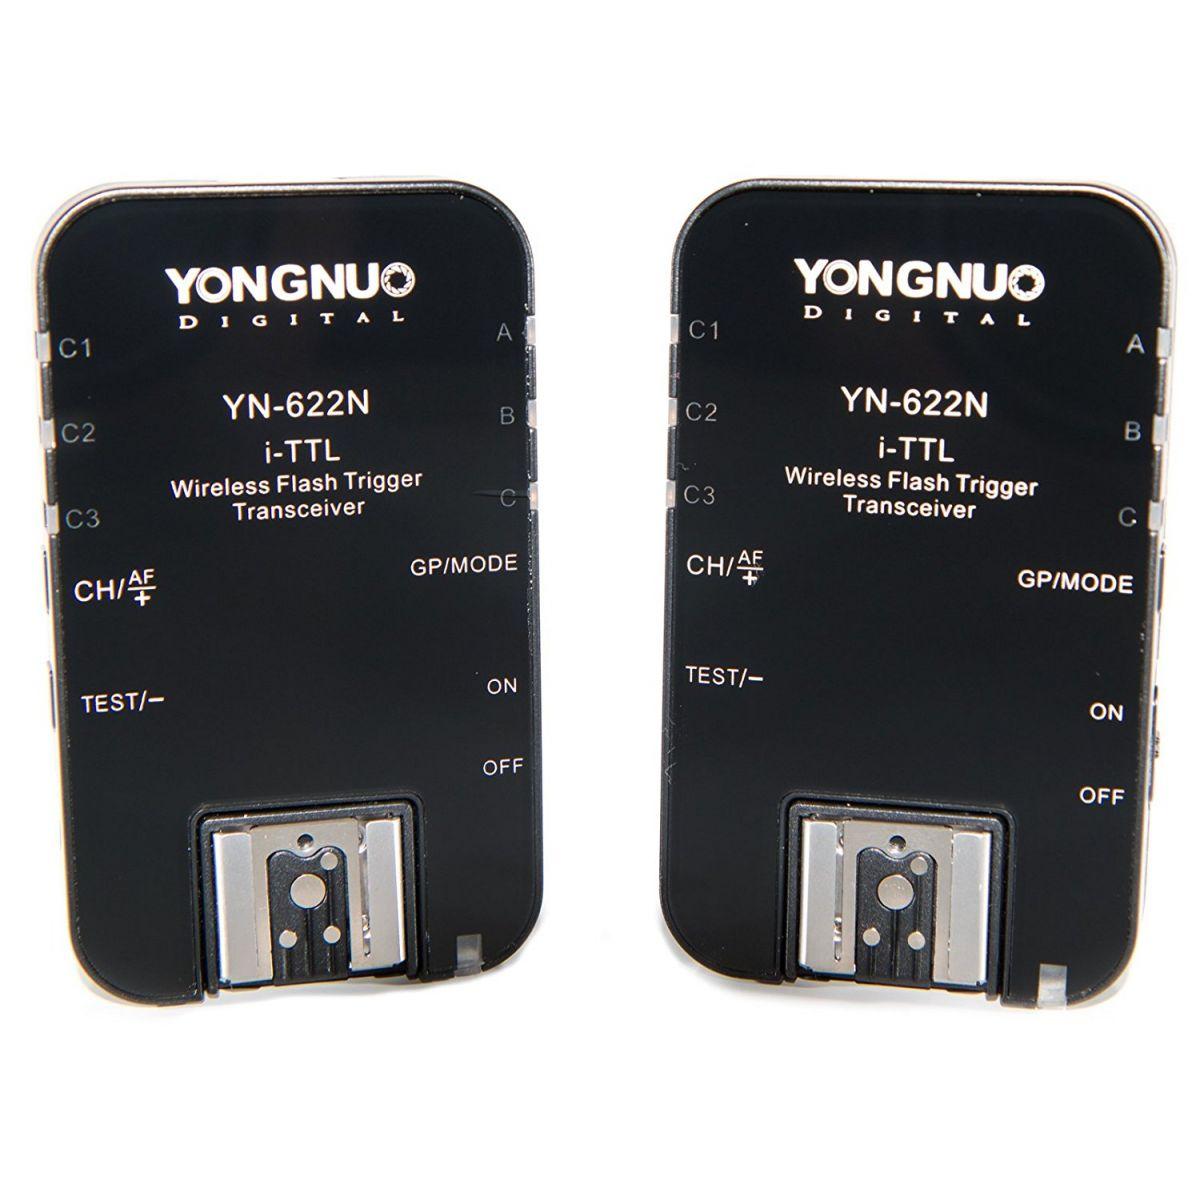 Radio Flash Sem Fio Yongnuo Yn-622n Para Câmeras DSLR Nikon